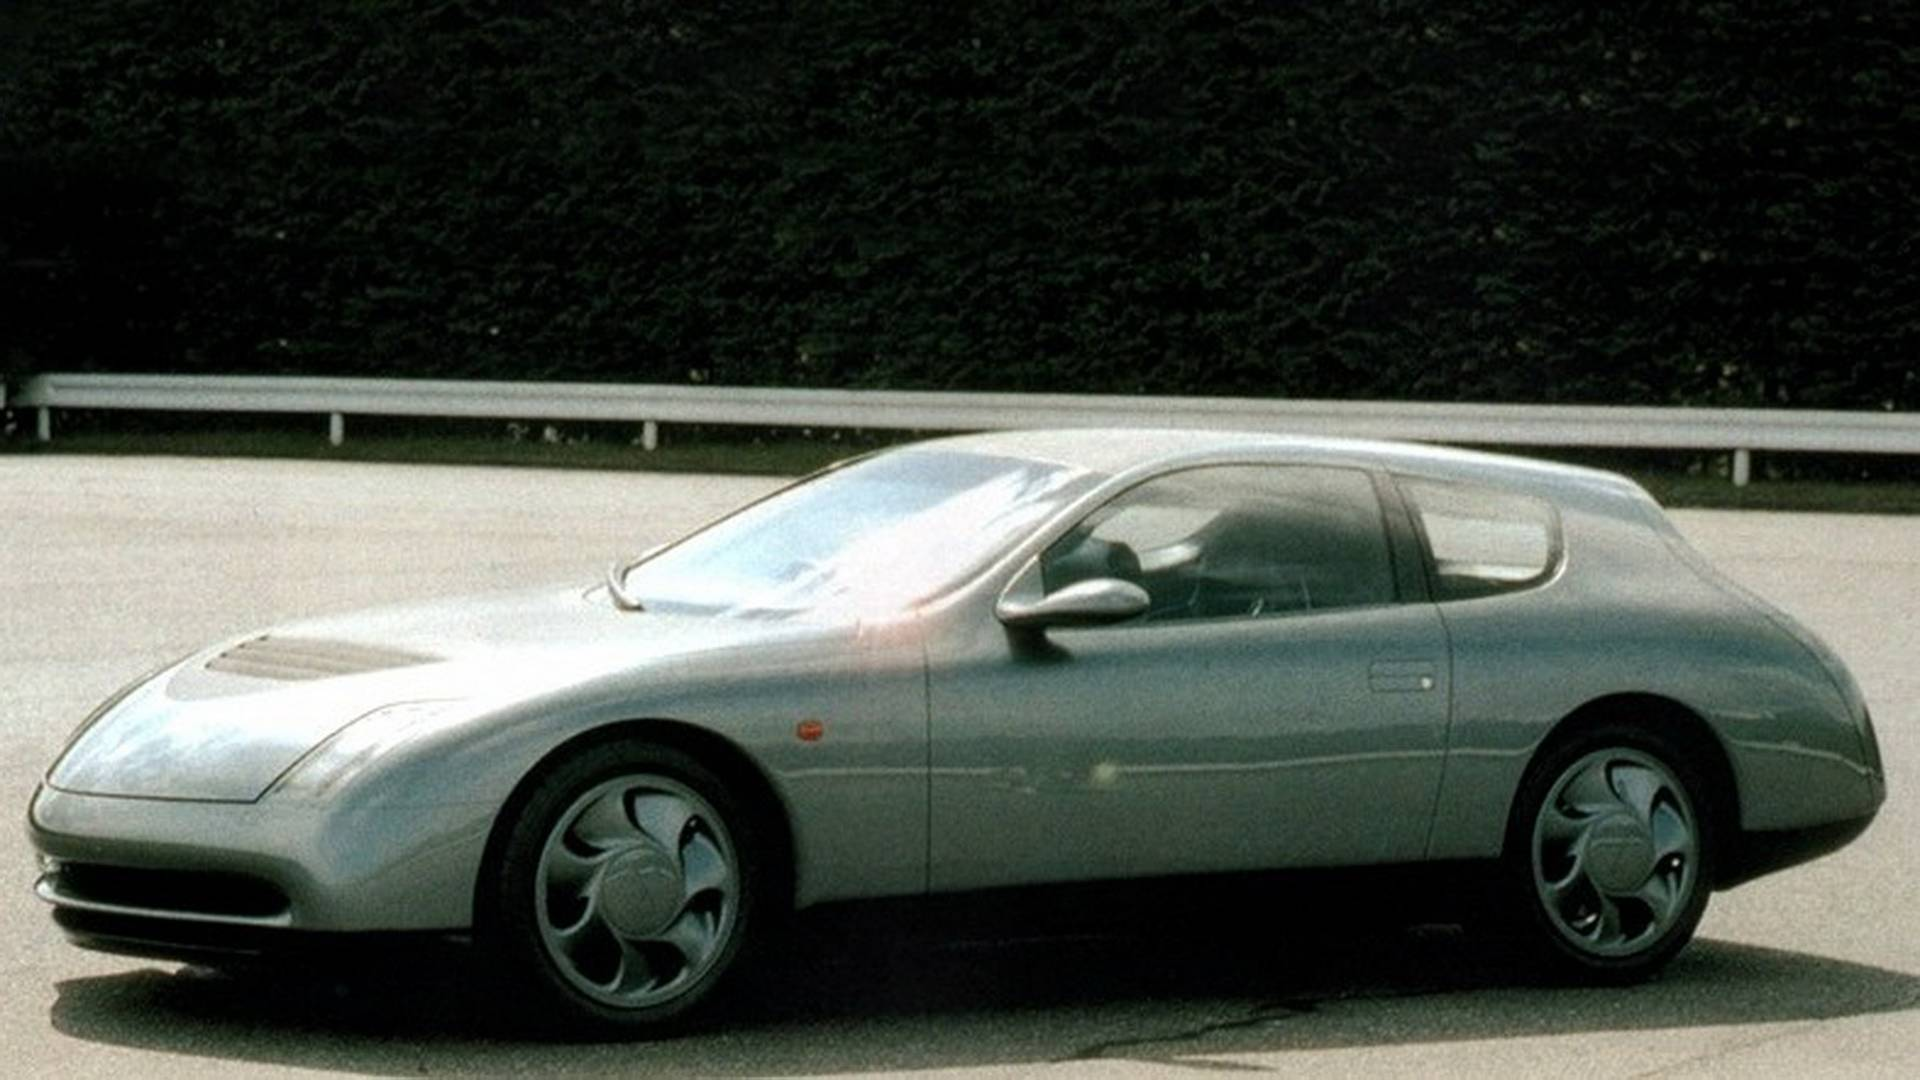 5a159b7ba6db7 1989 toyota 4500gt تویوتا ۴۵۰۰ جی تی ، نقد بررسی این خودرو   اجاره ماشین